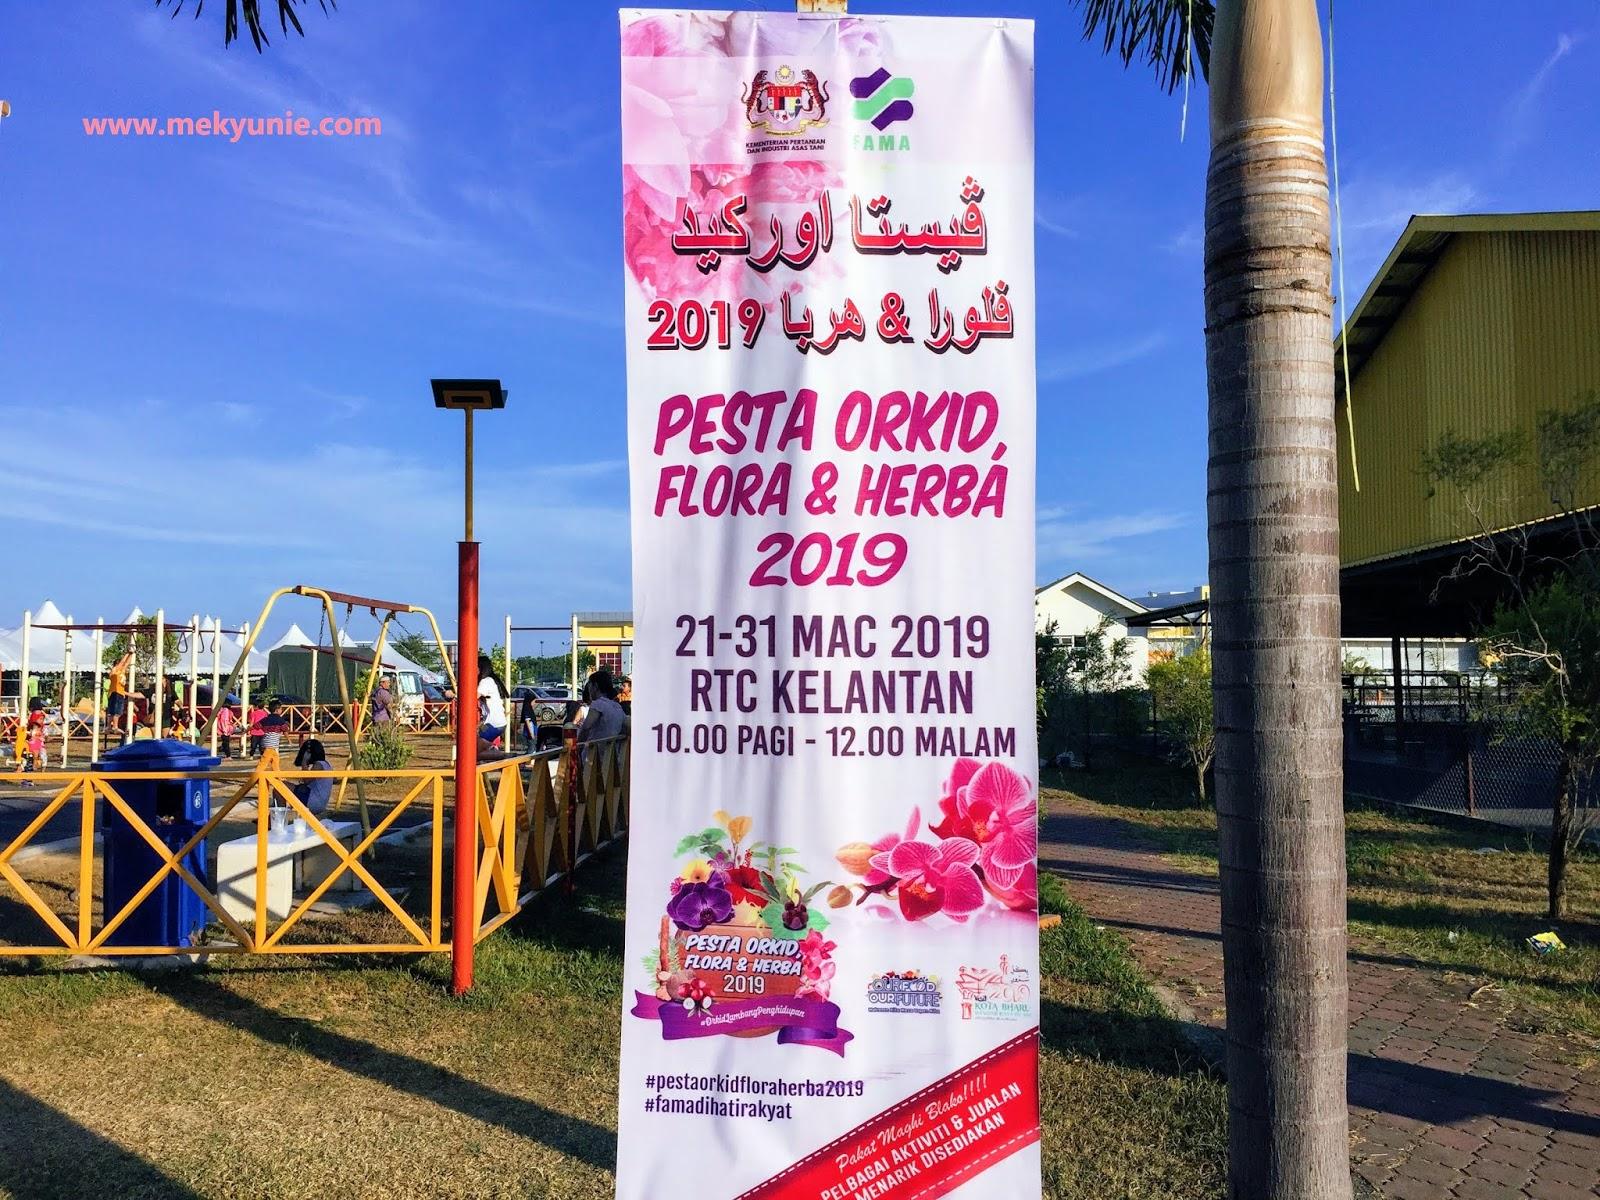 Pesta Orkid Kelantan 2019 Queenbee By Mek - Pesta Flora, Photos From Fakhrul Fractal Xzaxx On Myspace